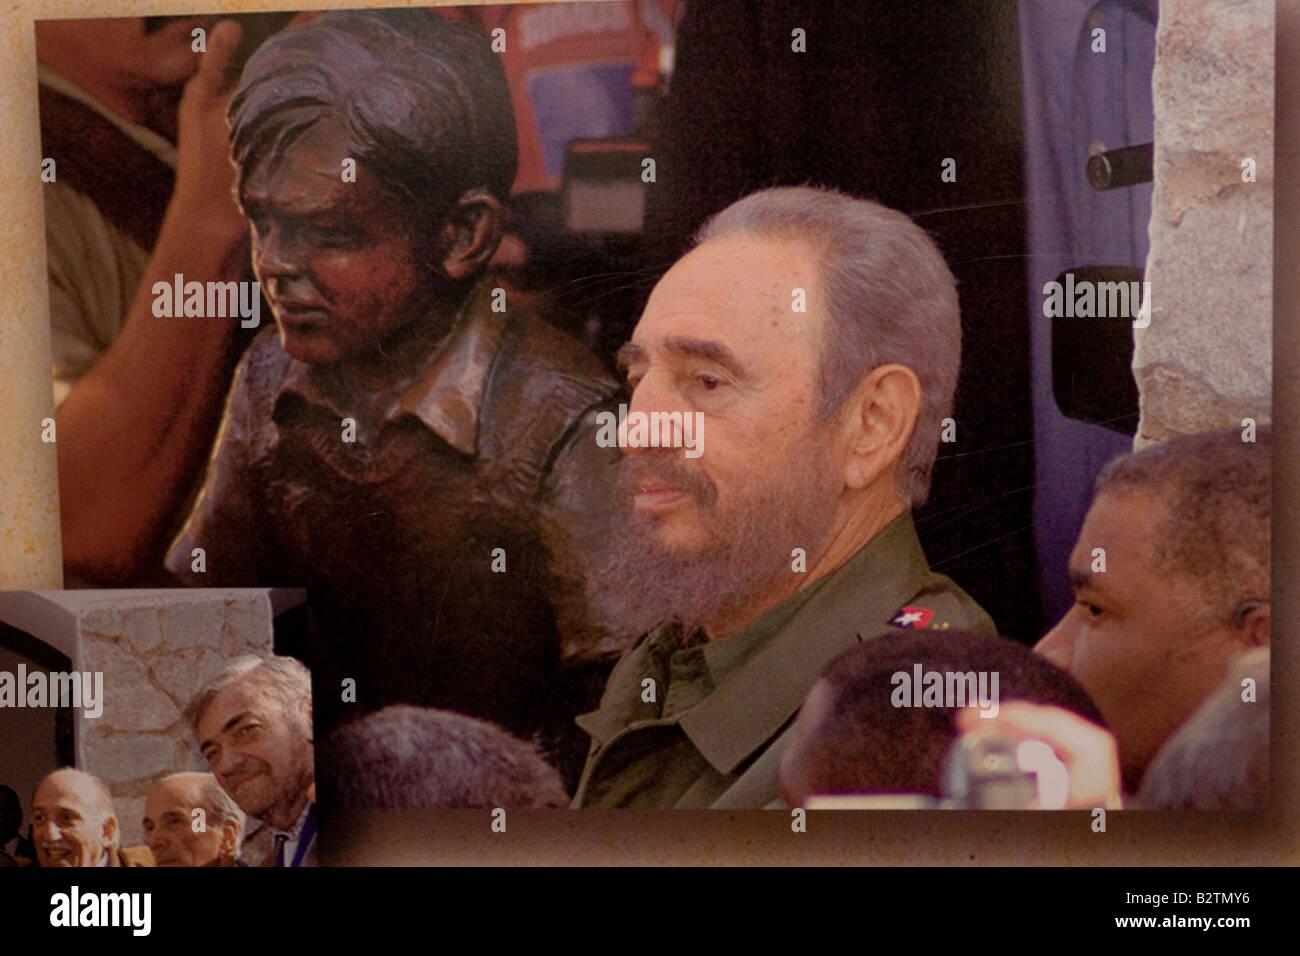 Fidel Castro posing besides a Ernesto Che Guevara boy sculpture in the facade of the Che Guevara museum in Alta Gracia, Cordoba Stock Photo